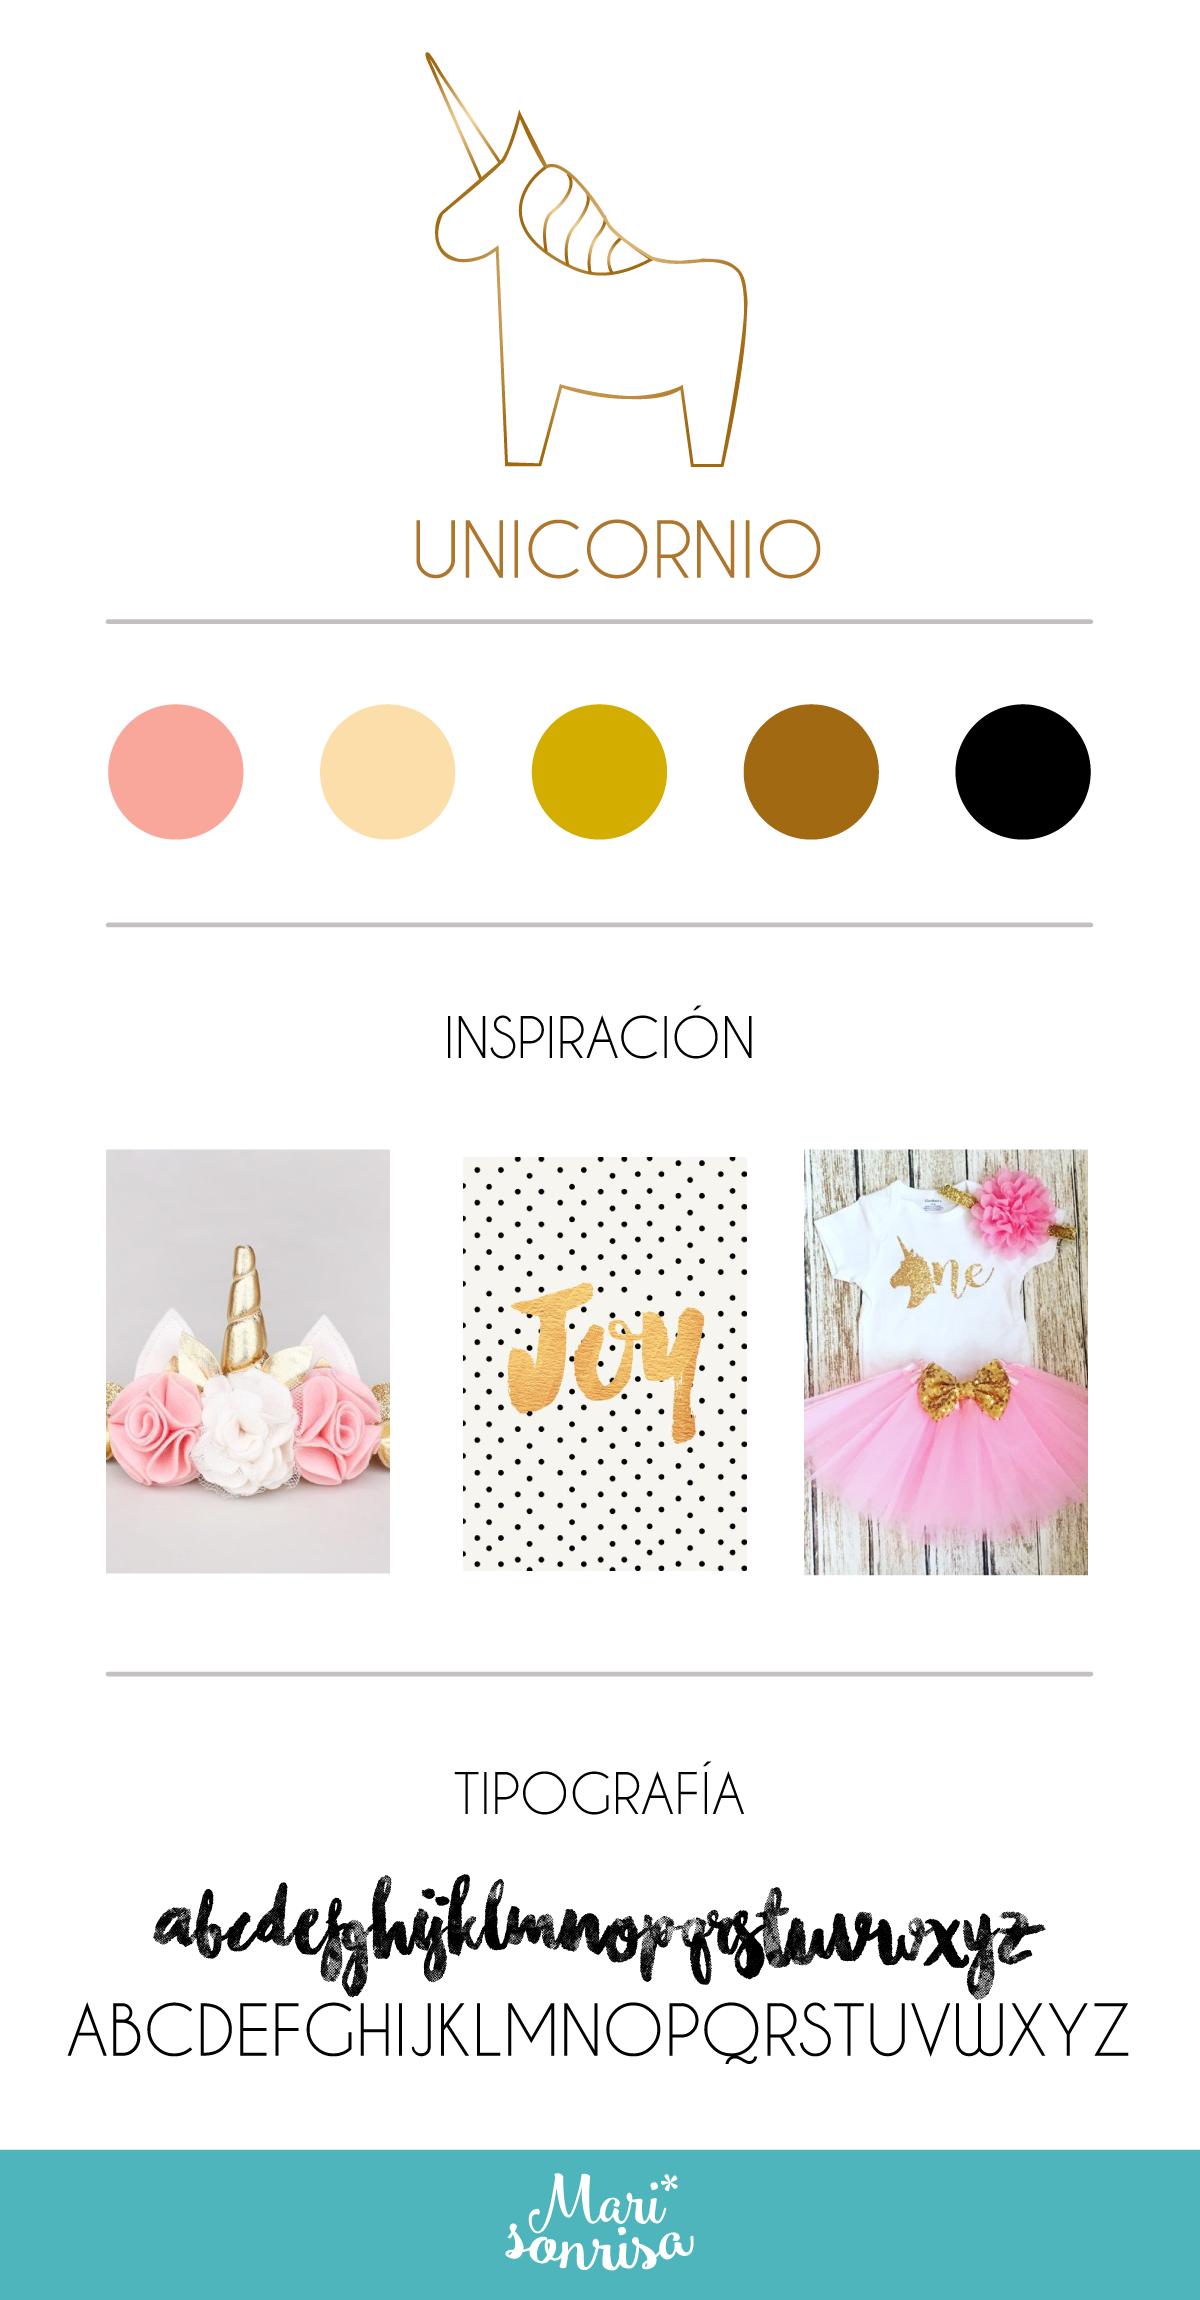 db6640e7b8 logo, design, inspiration, unicornio, marca de ropa para niños Diseño De  Marca